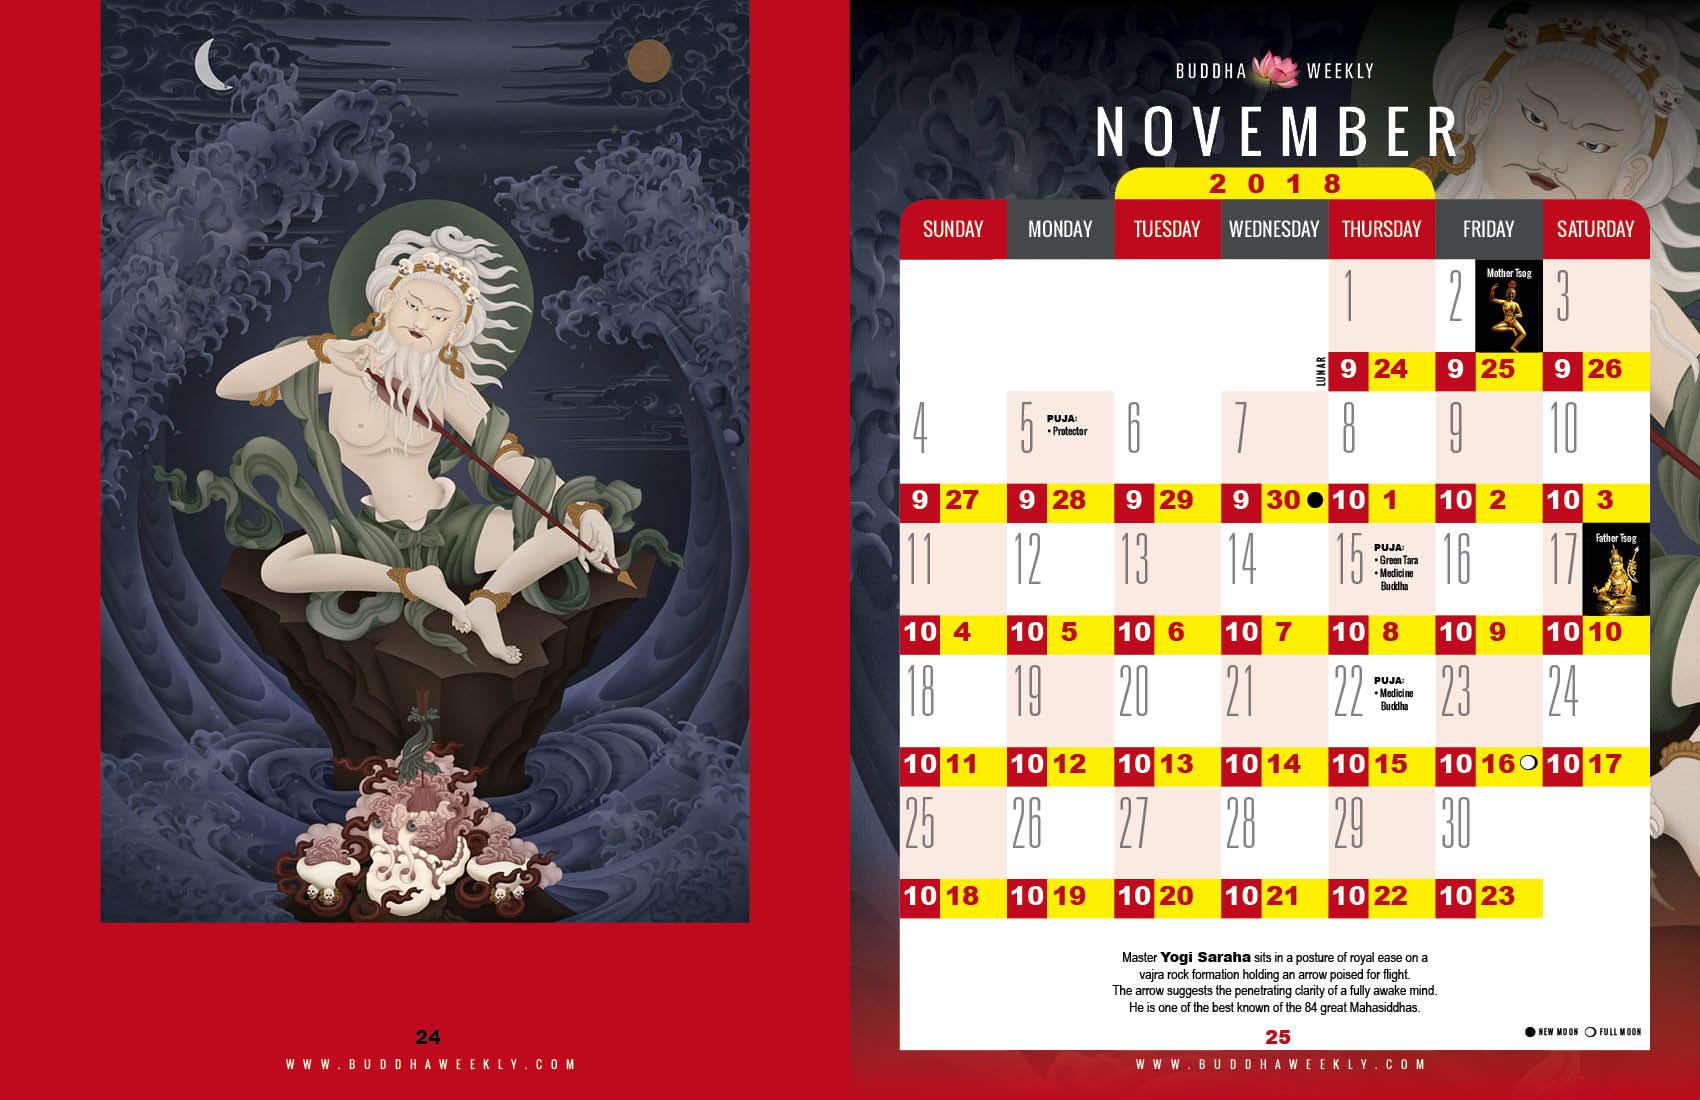 Lunar Calendar 2018 12 Buddha Weekly 11 November 11